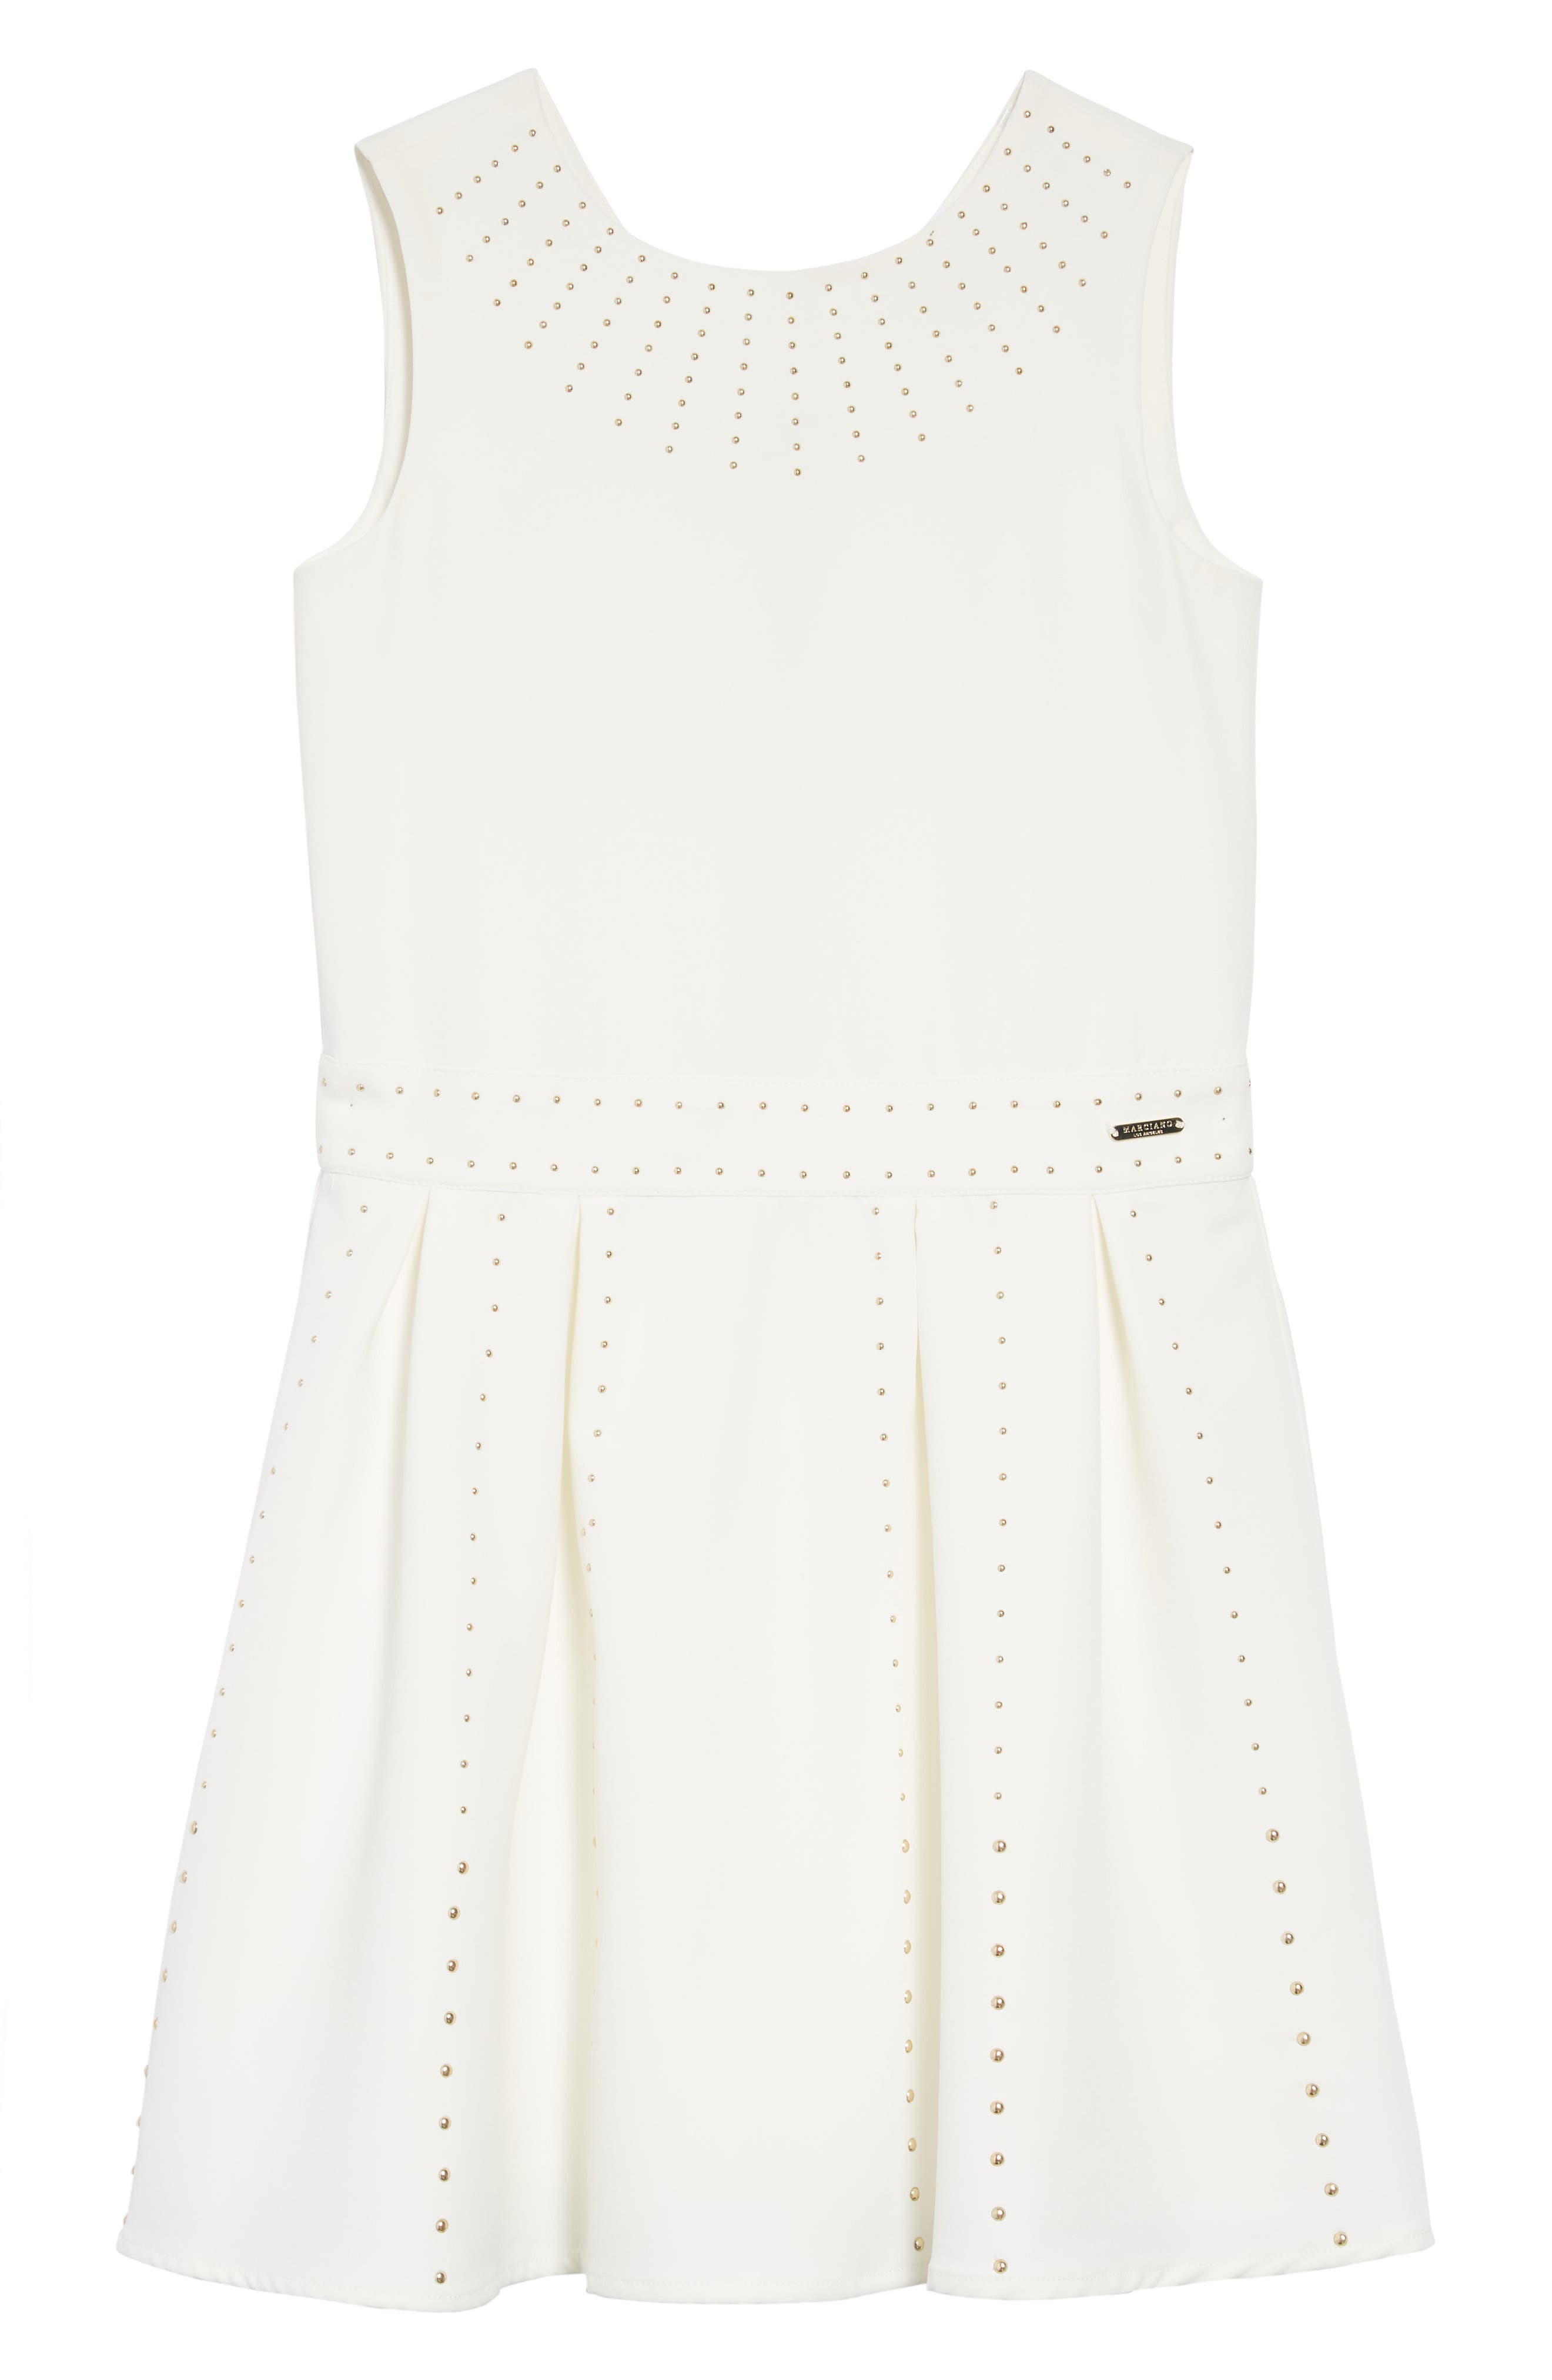 Studded Skater Dress,                         Main,                         color, True White A000